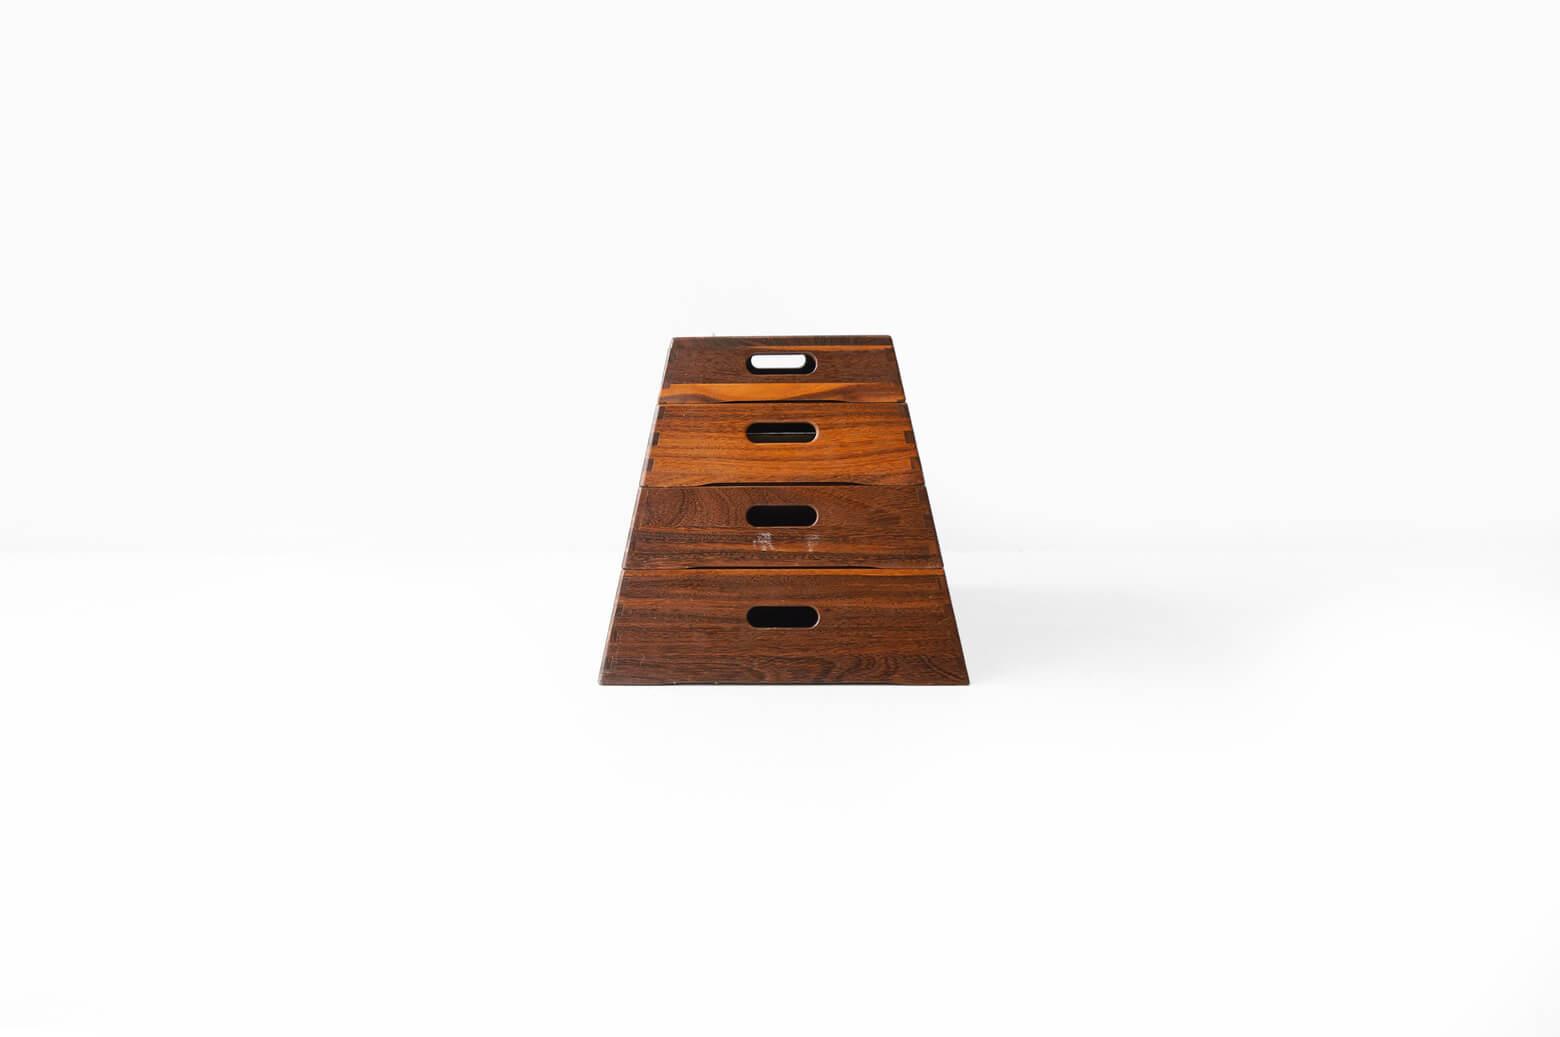 Vaulting Storage Box Walnut/跳び箱 収納ボックス ウォルナット インテリア